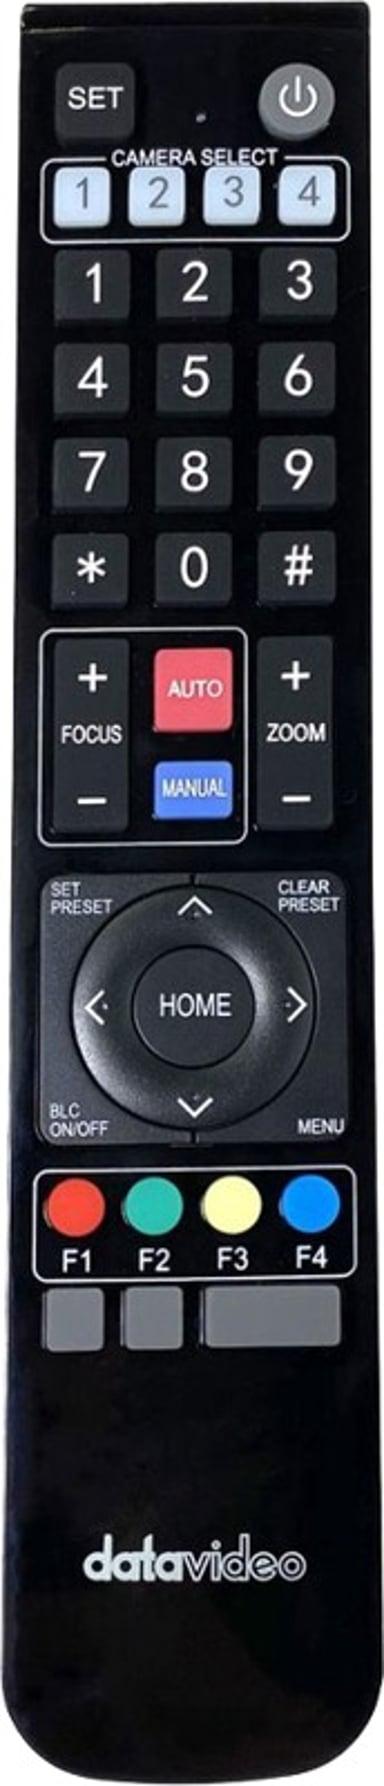 Datavideo Remote for PTC-140